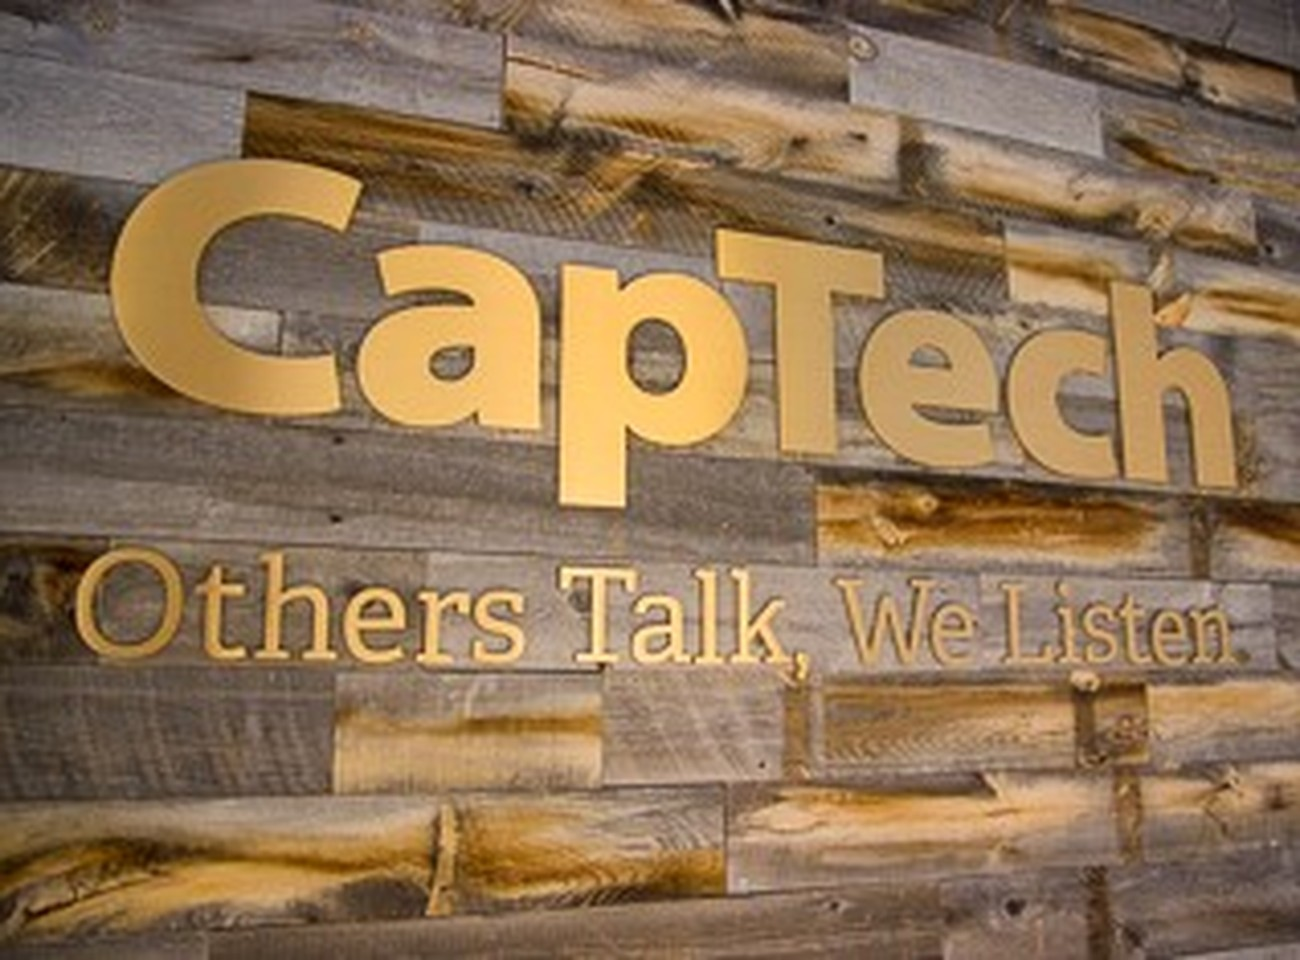 CapTech Careers